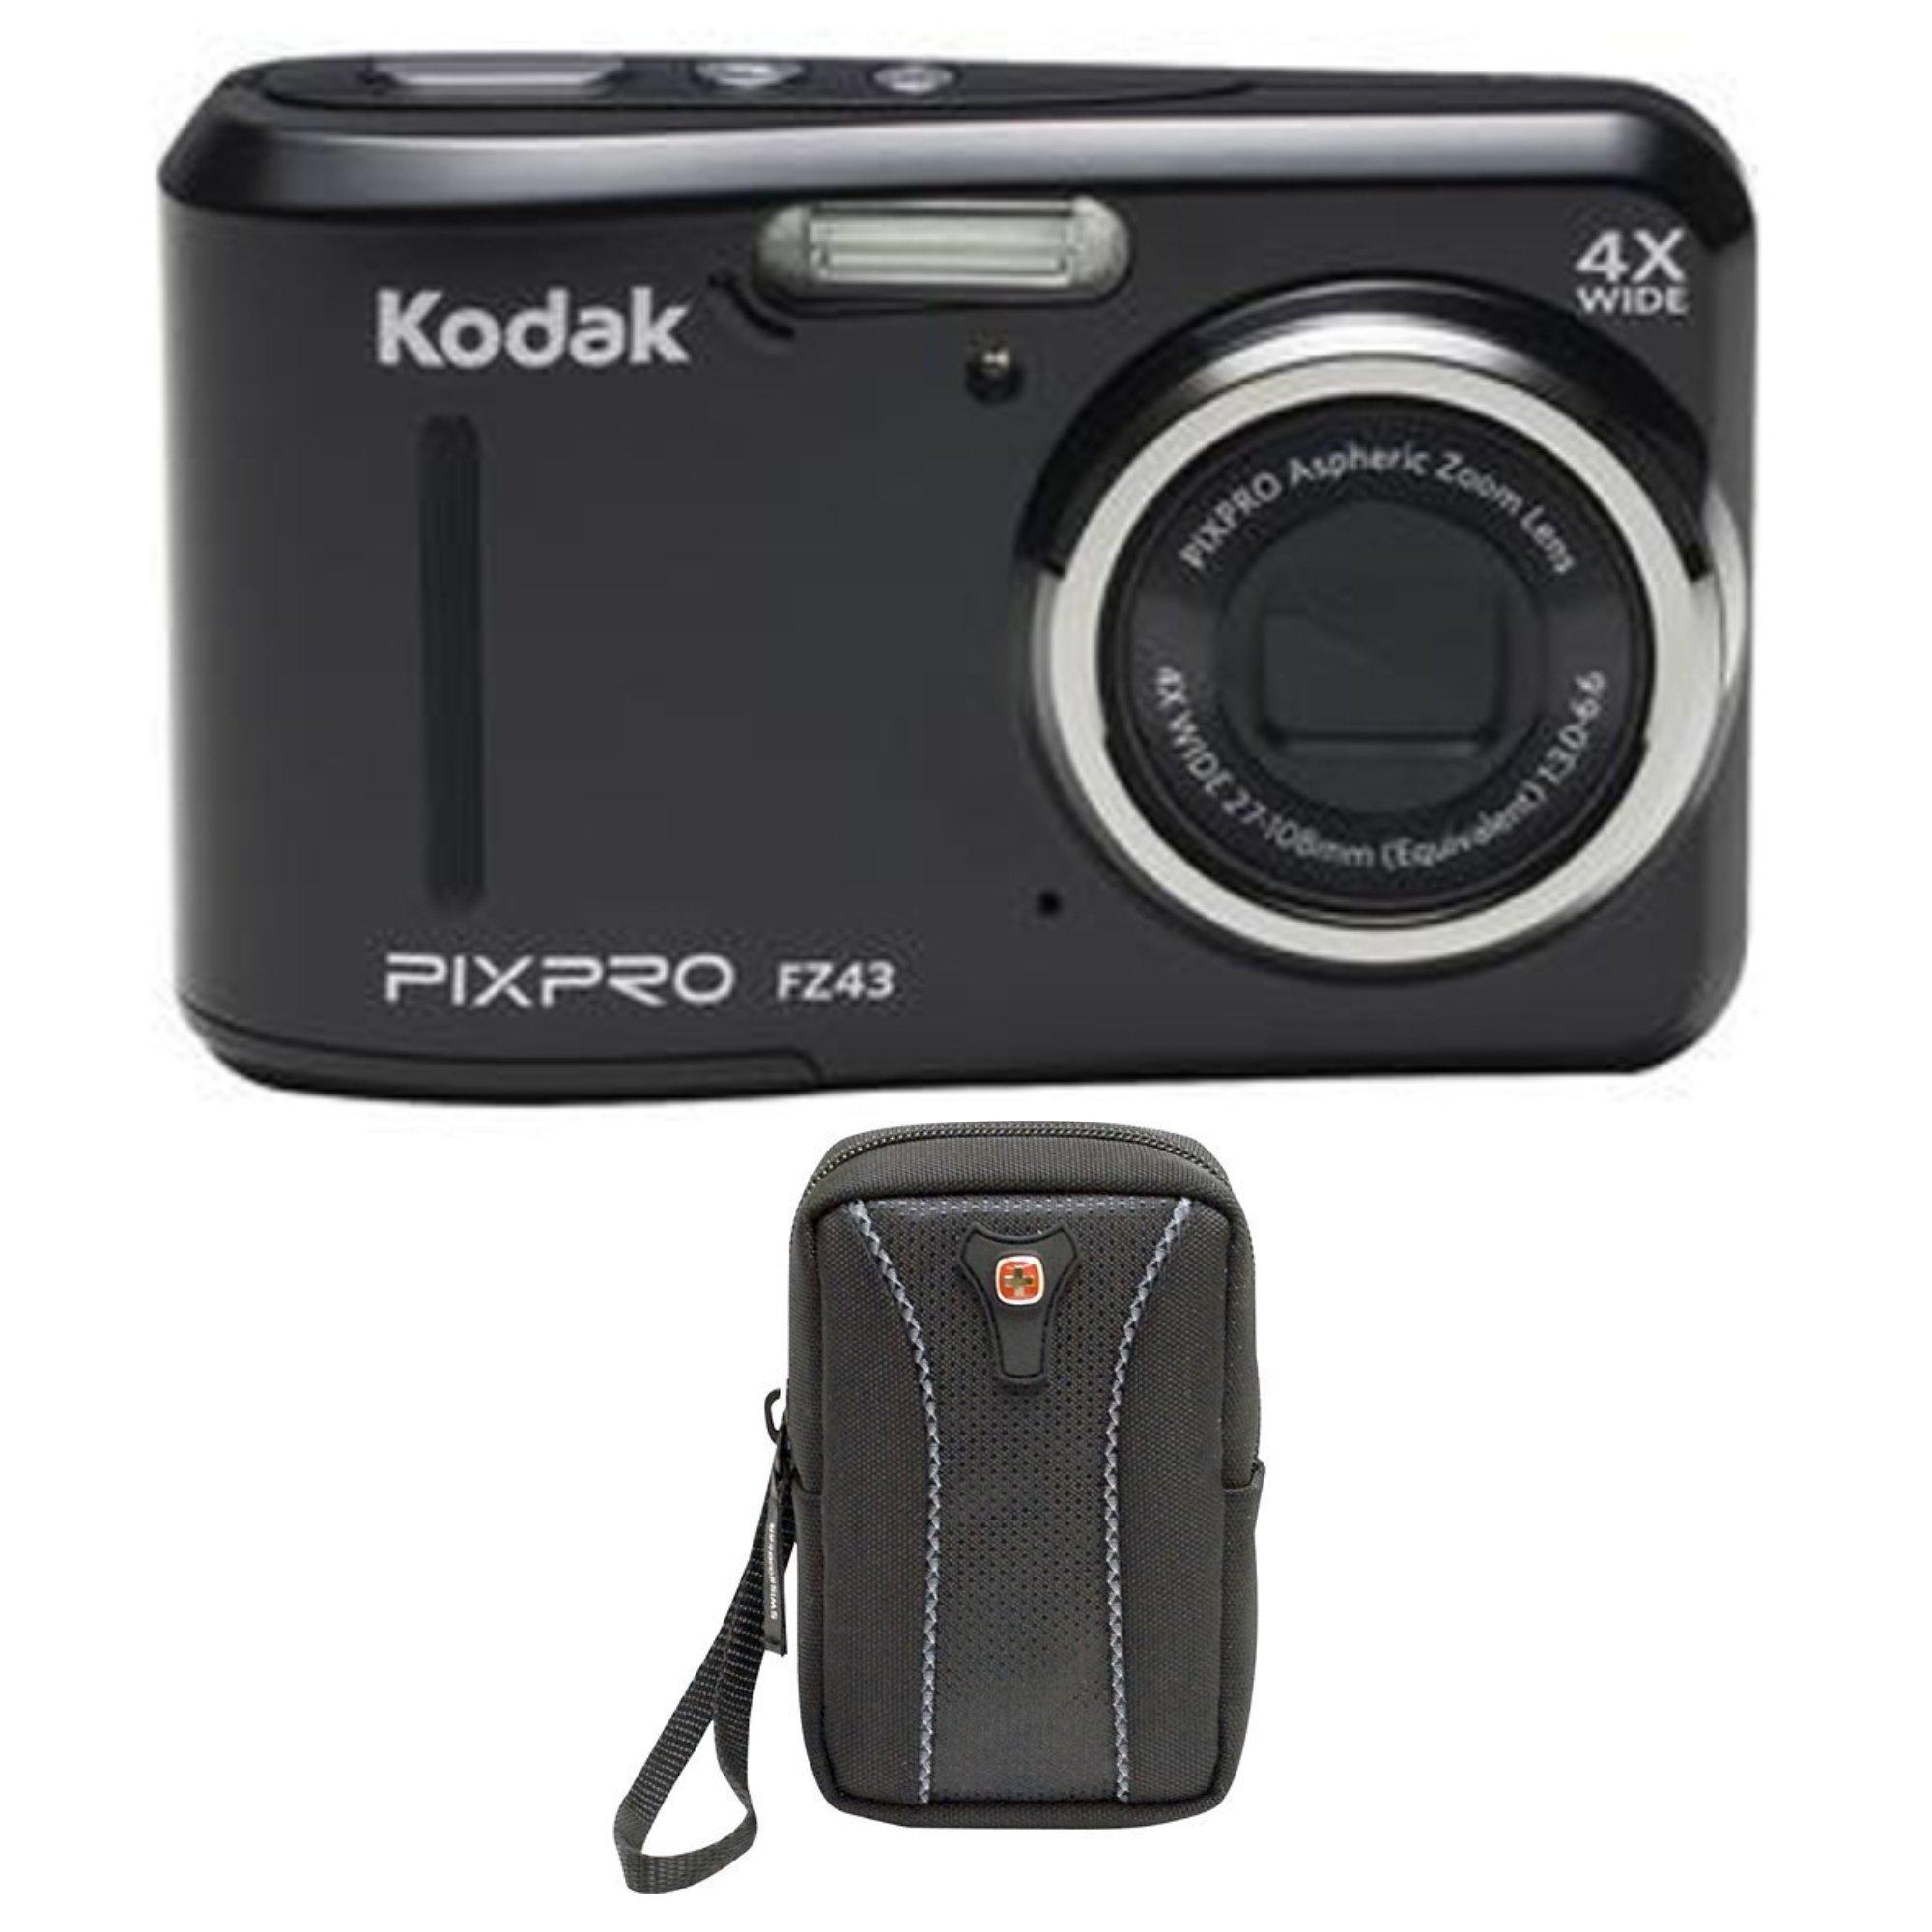 Kodak PIXPRO FZ43 16 MP Digital Camera, 4X Optical Zoom, 2.7'' LCD (Black) Bundle by Kodak